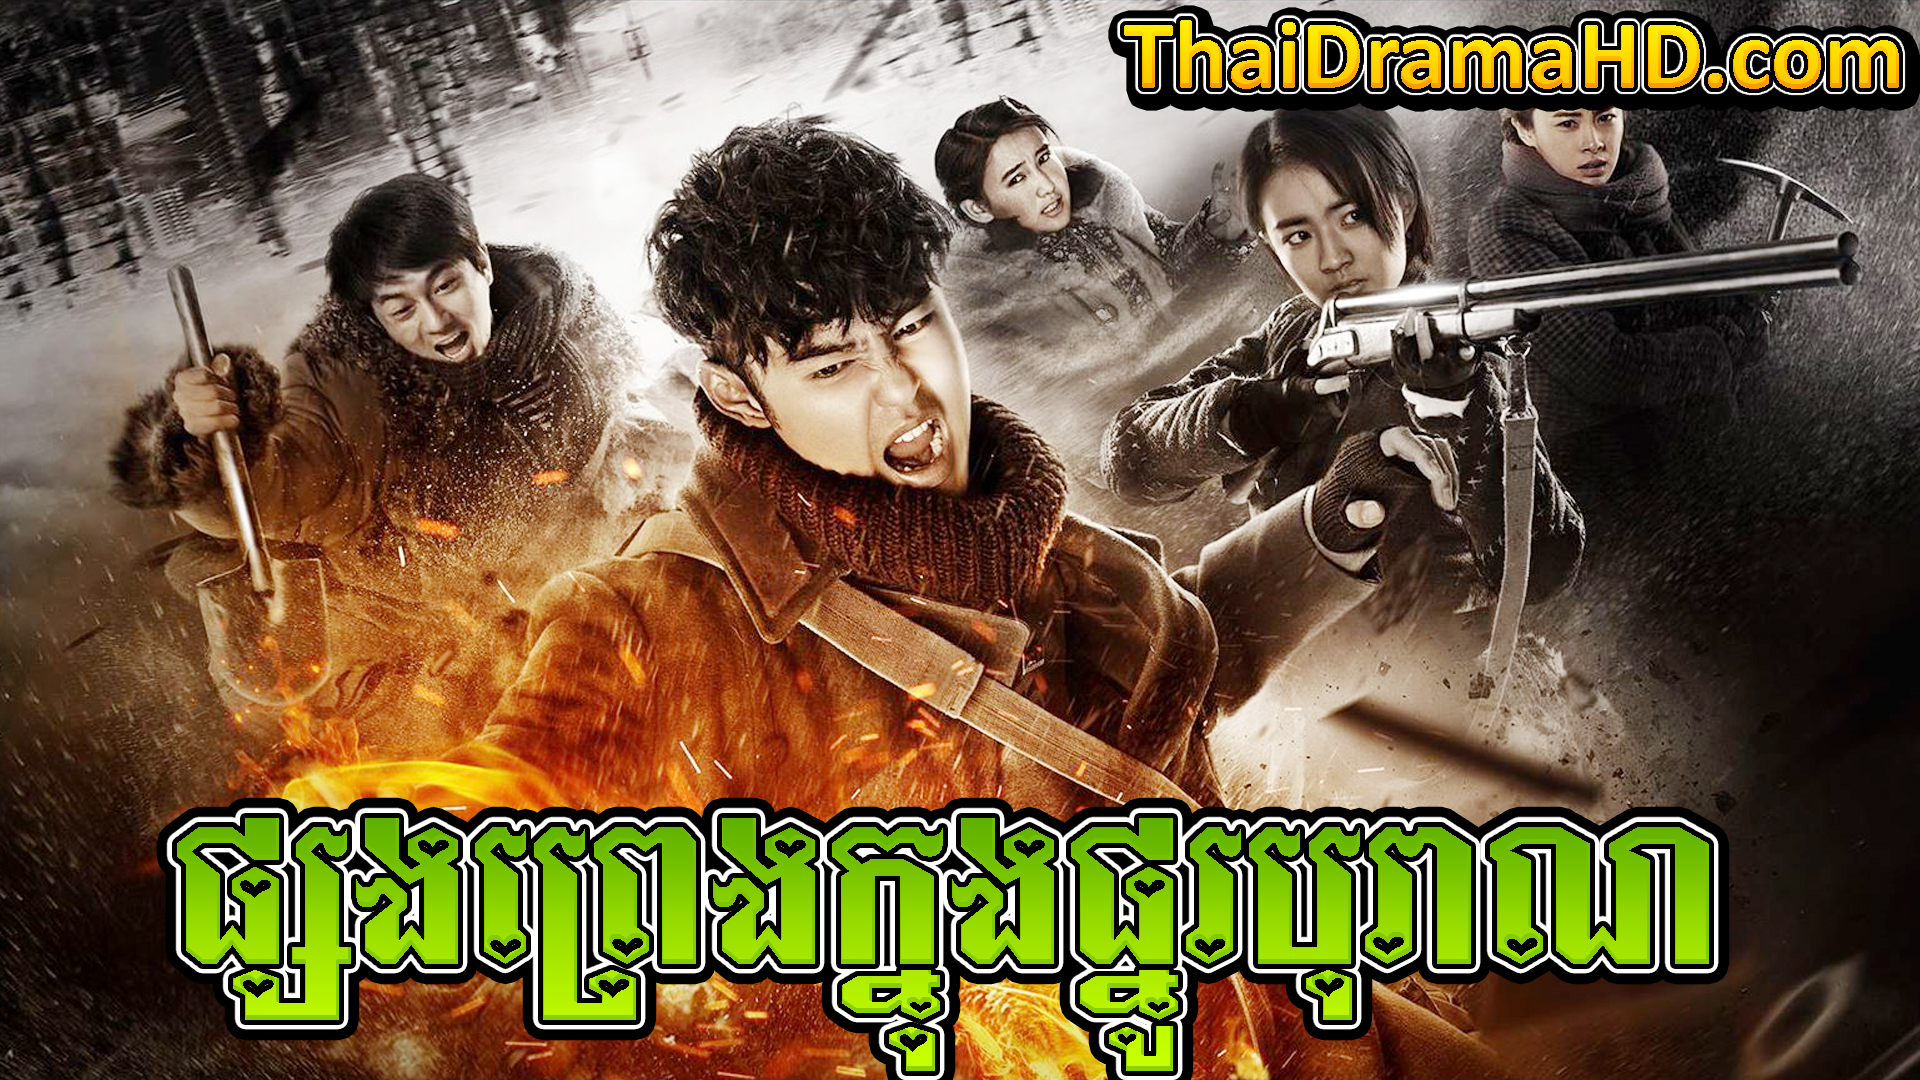 Phsang Preng Khnong Phno Boran | Thai Drama | Khmer Movie | Phumikhmer | movie-khmer | video4khmer | khmotions | kolabkhmer | khmer drama | ksdrama | cookingtips | roscheat | khmertimeskh | khmerkomsan | phumi7 | merlkon | film2us | movie2kh | sweetdrama | khmercitylove | khreplay | tvb cambodia drama | ckh7 | srokthai | phumimedia | phumi8 | khmer avenue | khmer search | Soyo | khmerfans